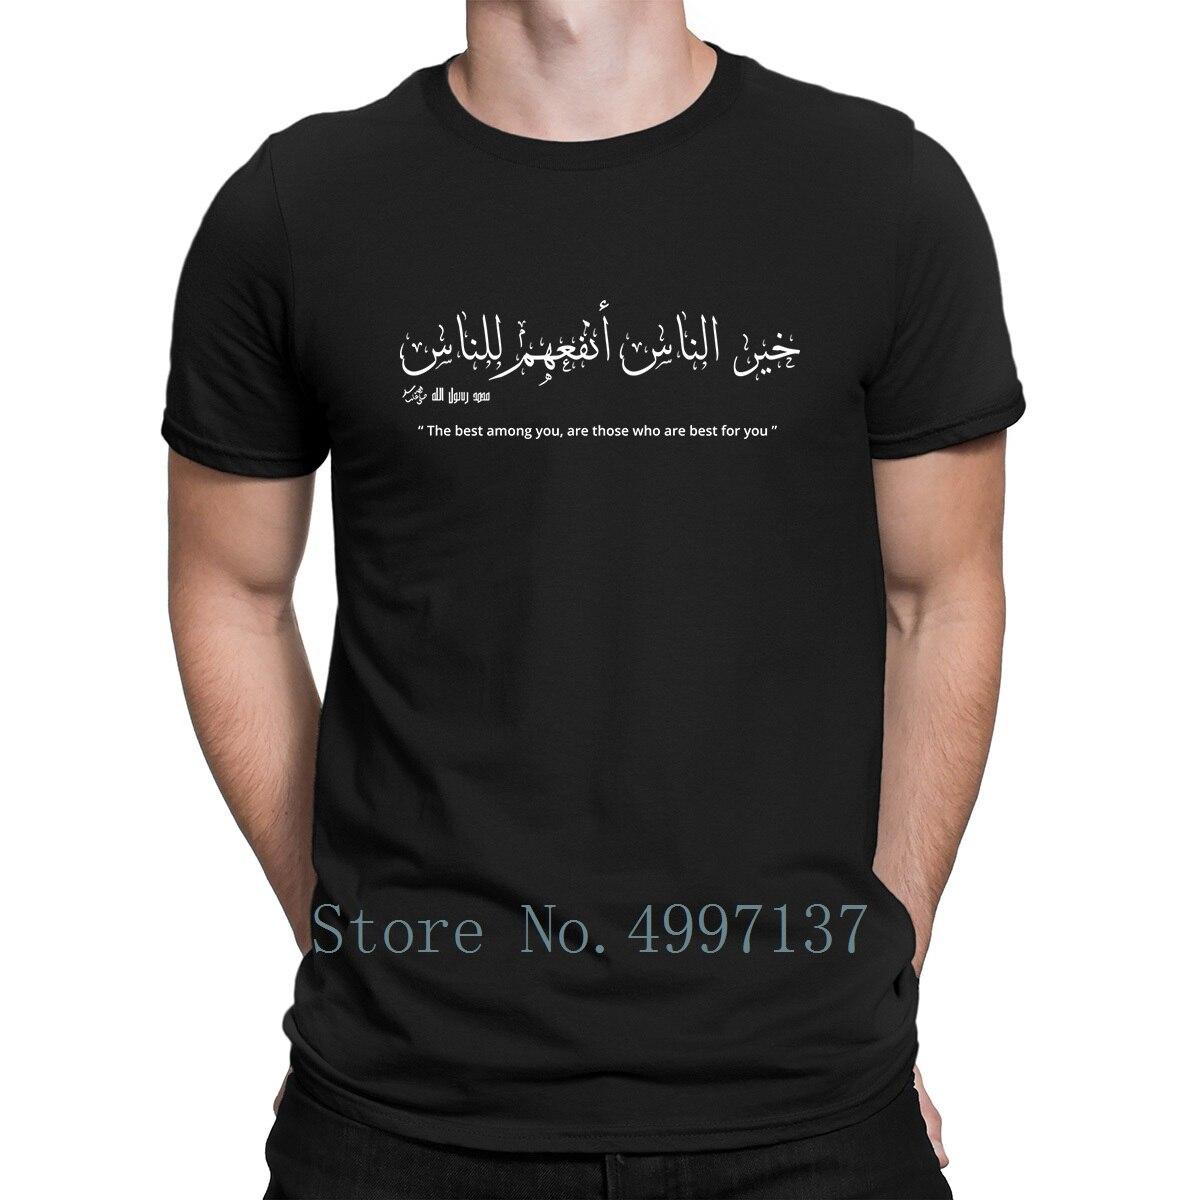 Islamic Shirt Arabic T Shirt Famous Novelty Tee Shirt Summer Style Clothing Size S-3xl Design Comfortable Shirt